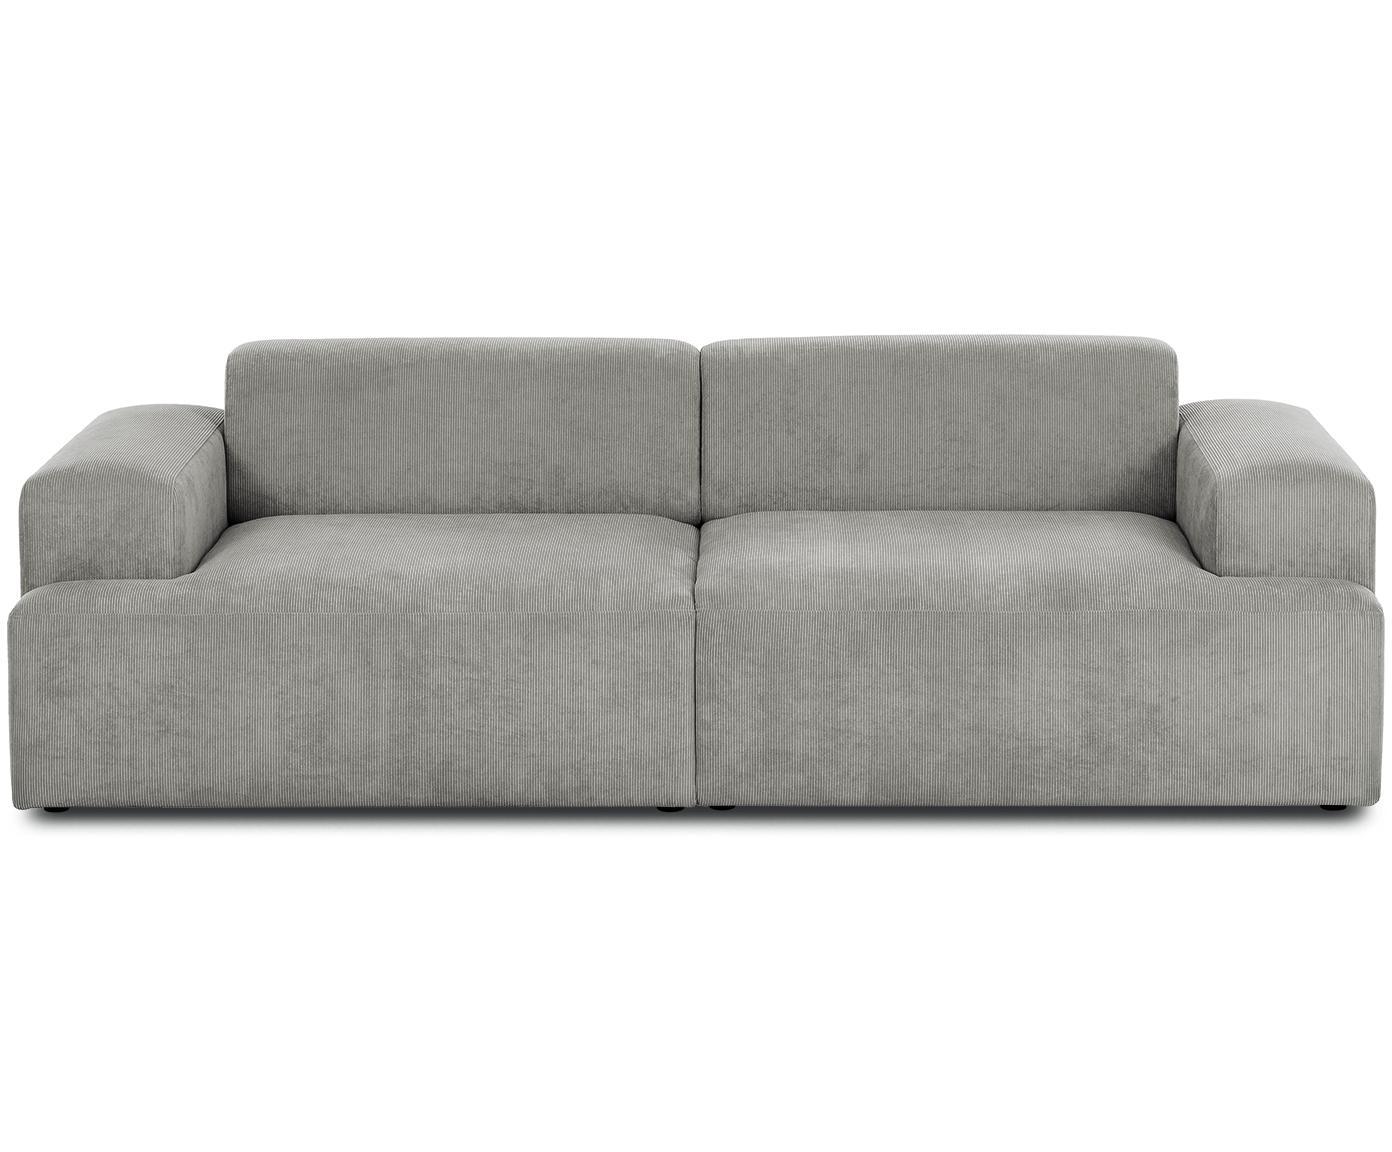 Cord-Sofa Melva (3-Sitzer), Bezug: Cord (92% Polyester, 8% P, Gestell: Massives Kiefernholz, Spa, Cord Grau, B 240 x T 101 cm